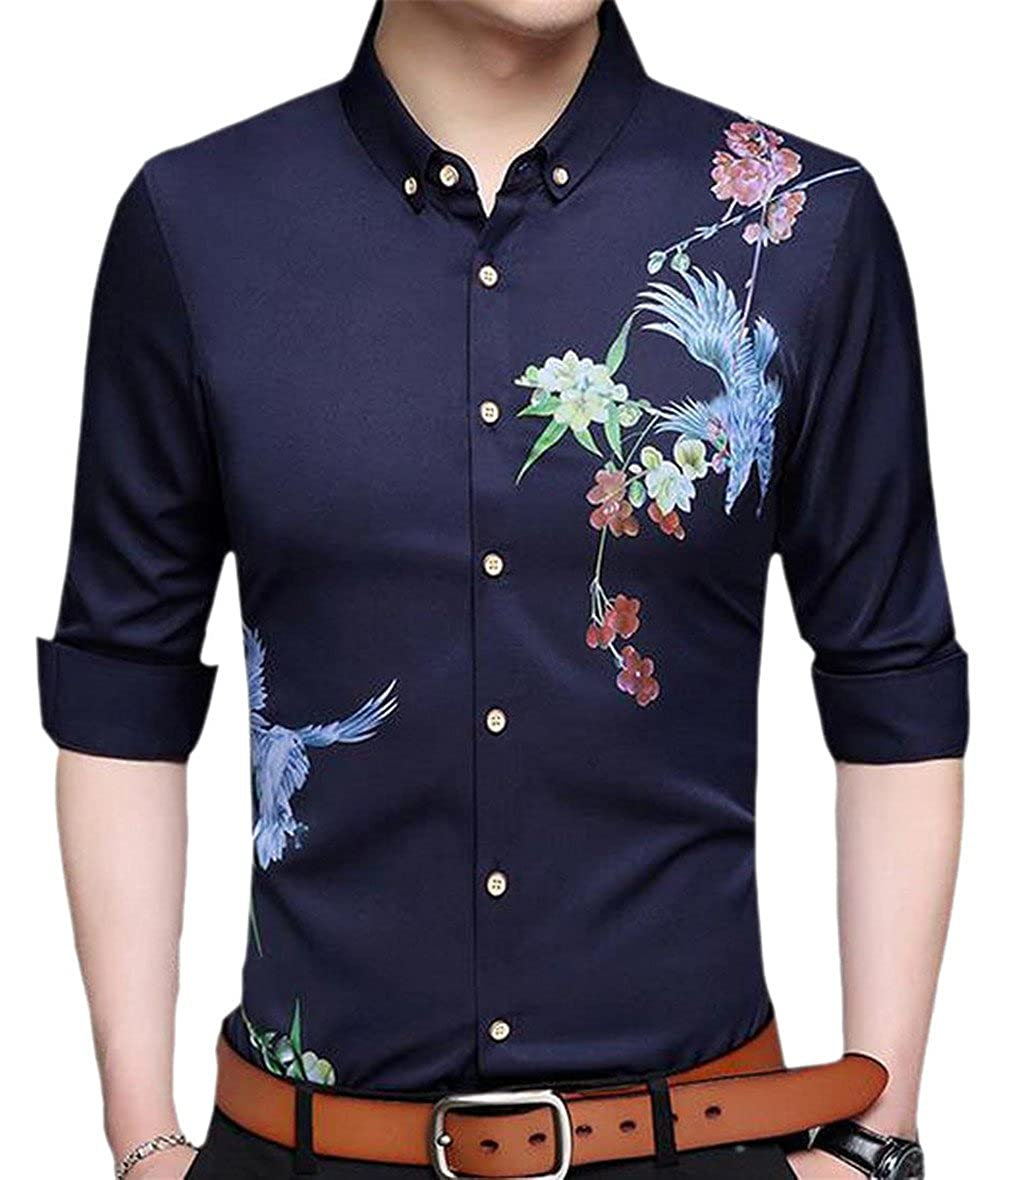 YY-qianqian Mens Casual Slim Fit Long Sleeve Floral Printed Button Down Dress Shirt